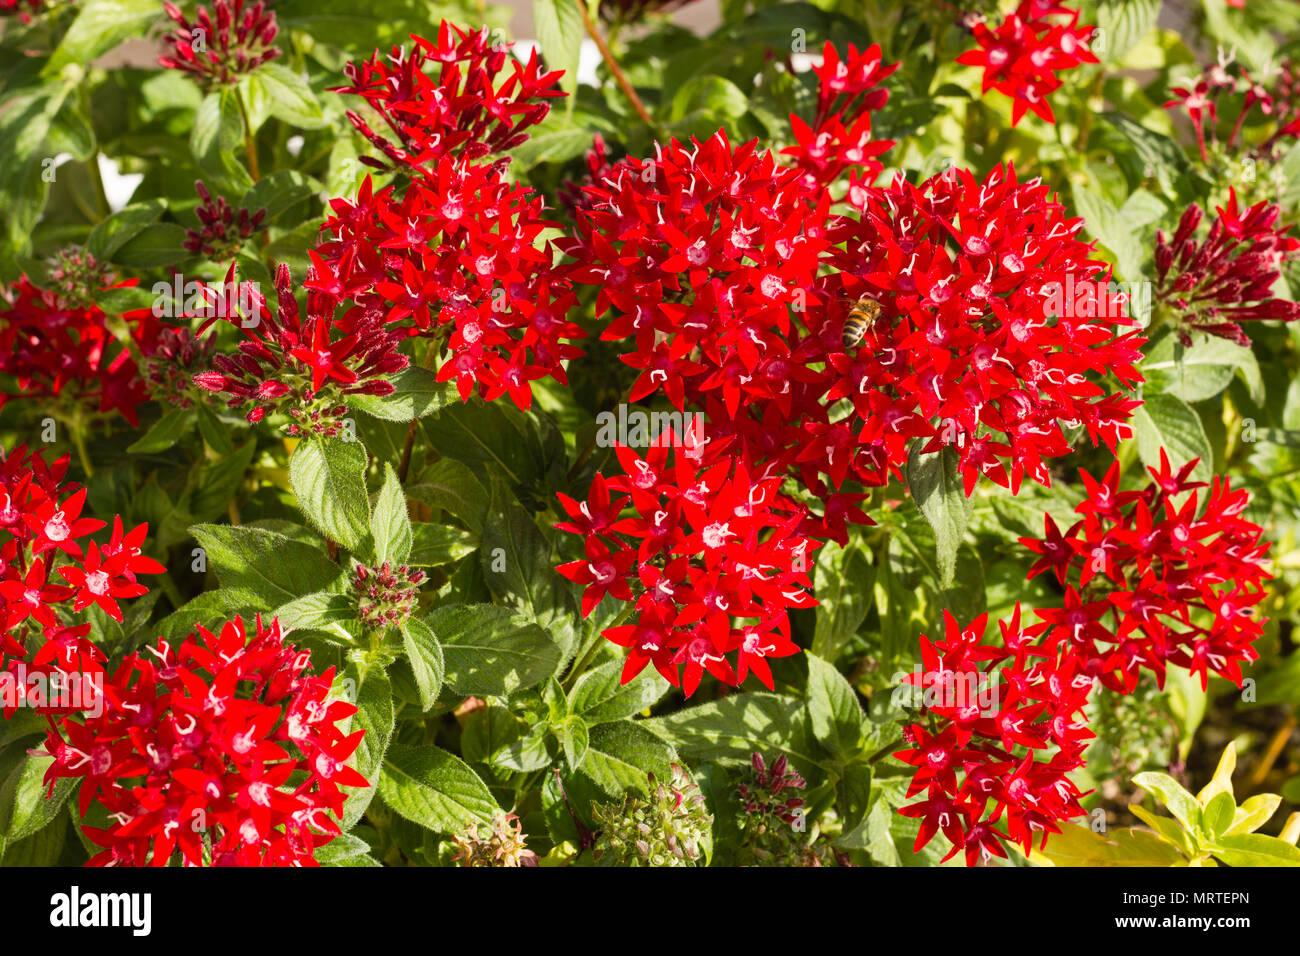 Blooming pentas flowers stock photo 186779229 alamy blooming pentas flowers mightylinksfo